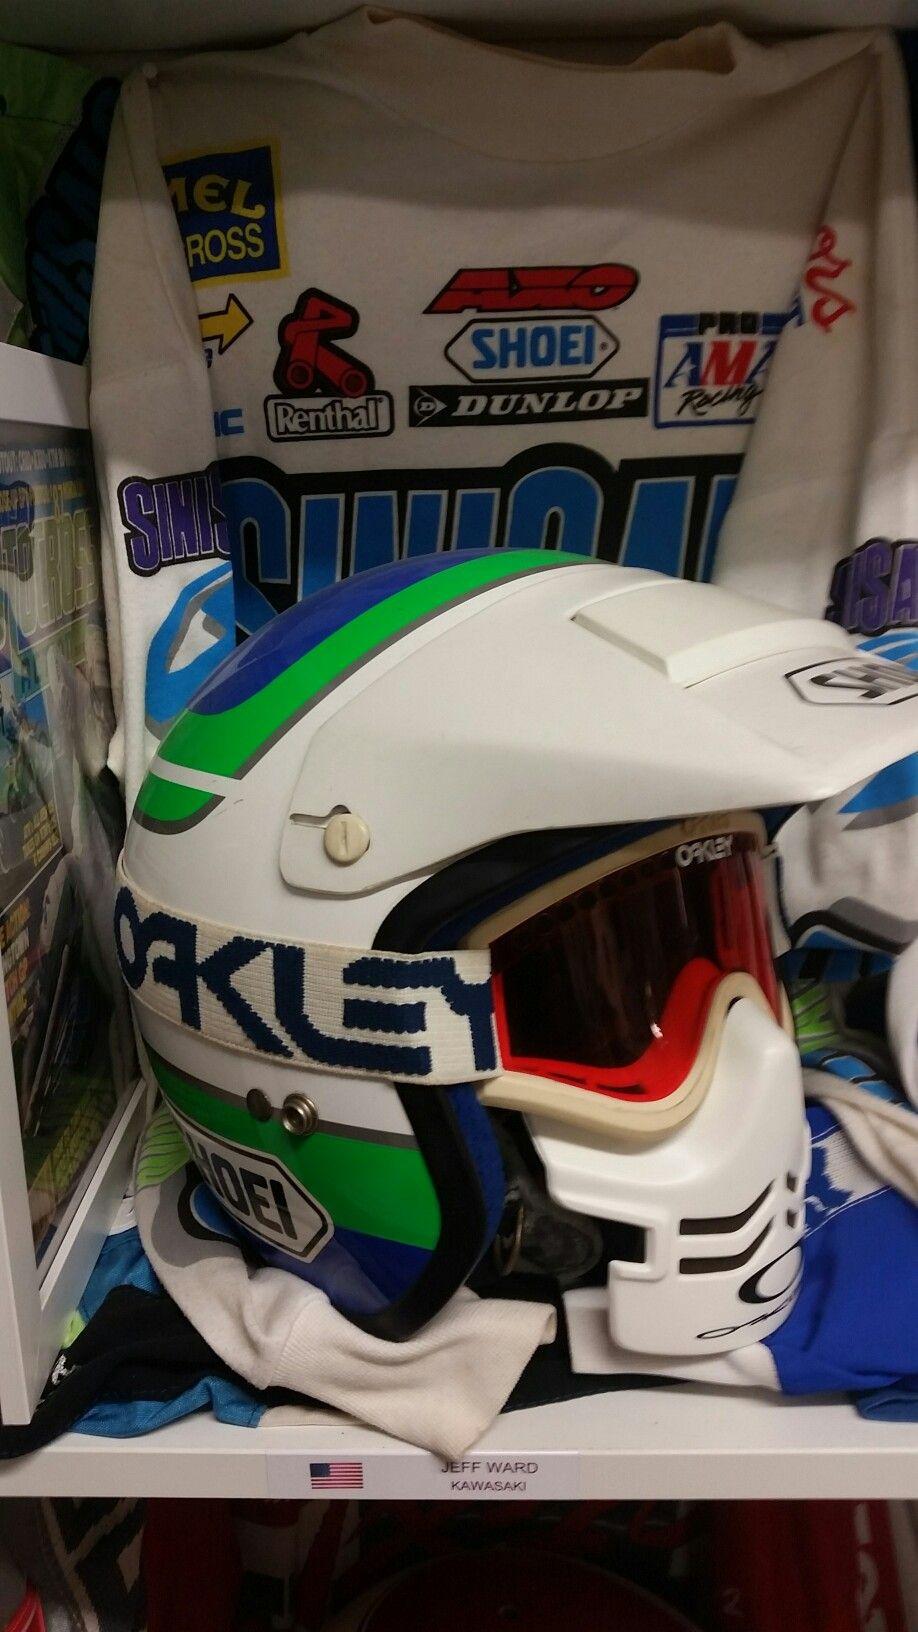 Jeff Ward Helmet Replica Vintage Motocross Racing Helmets Vintage Helmet